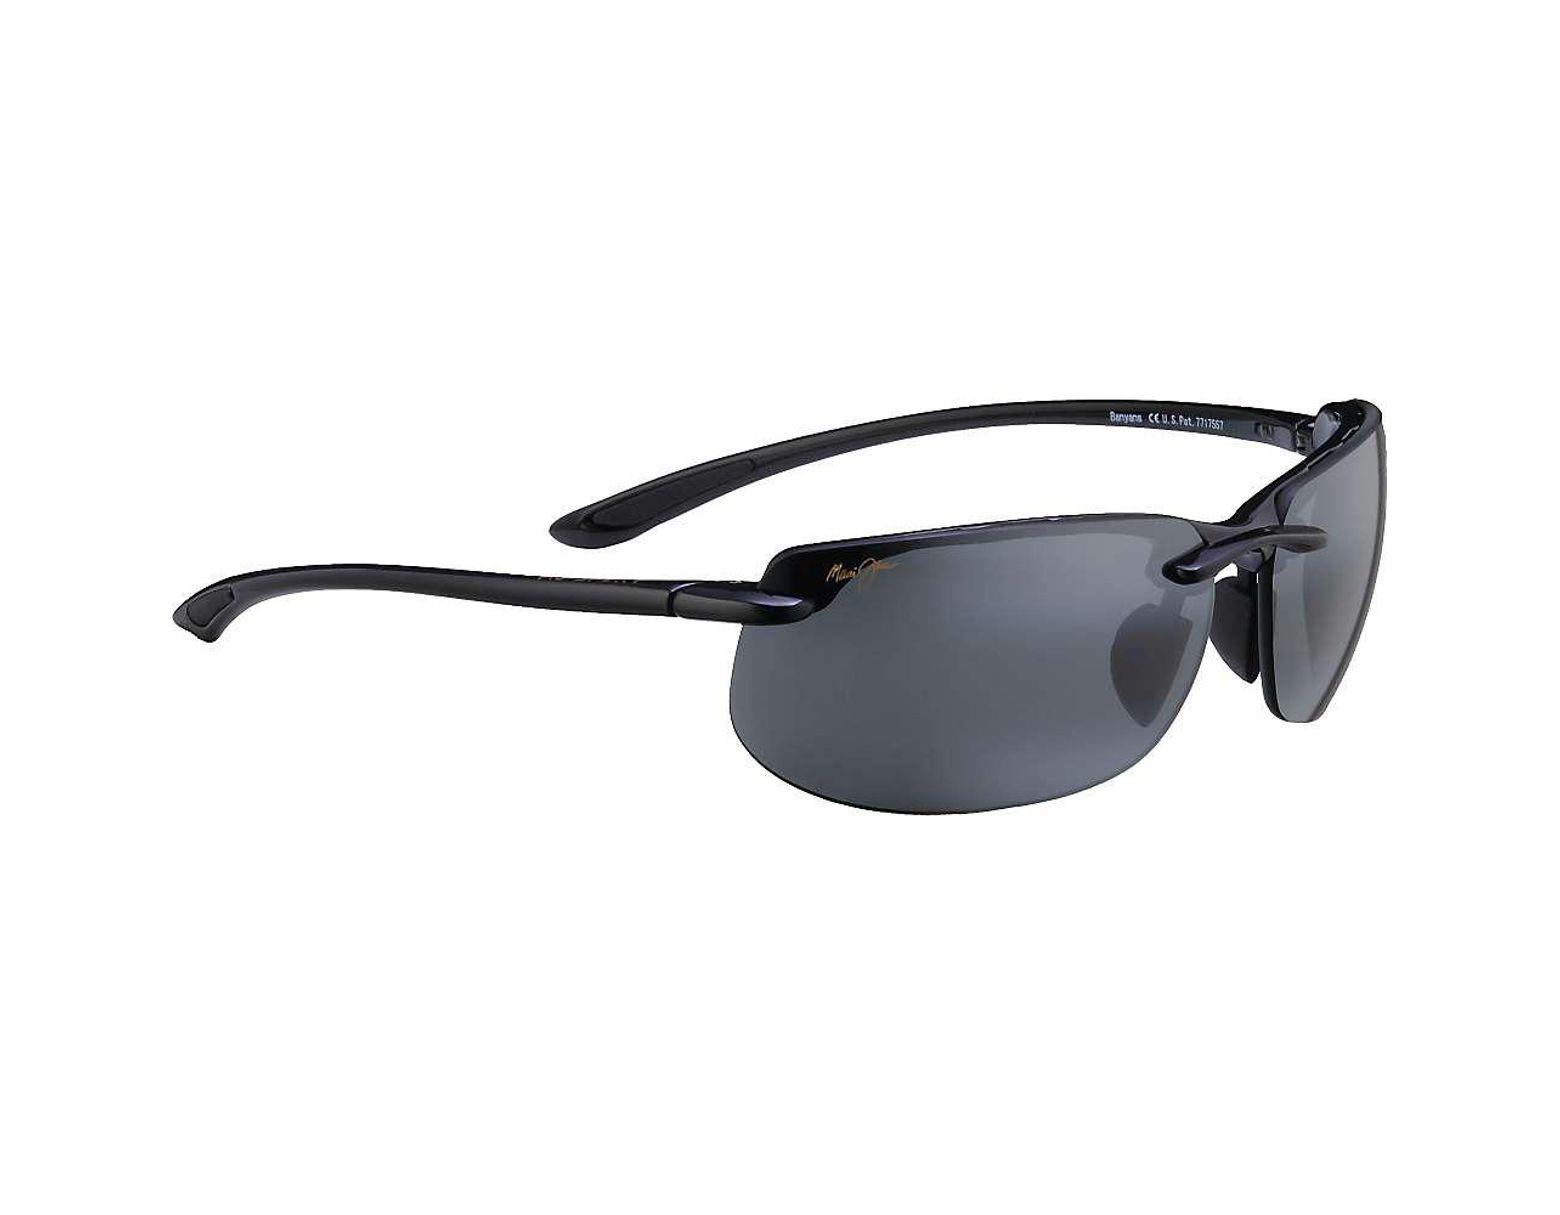 430076d654dd Maui Jim Banyans Polarized Sunglasses for Men - Lyst